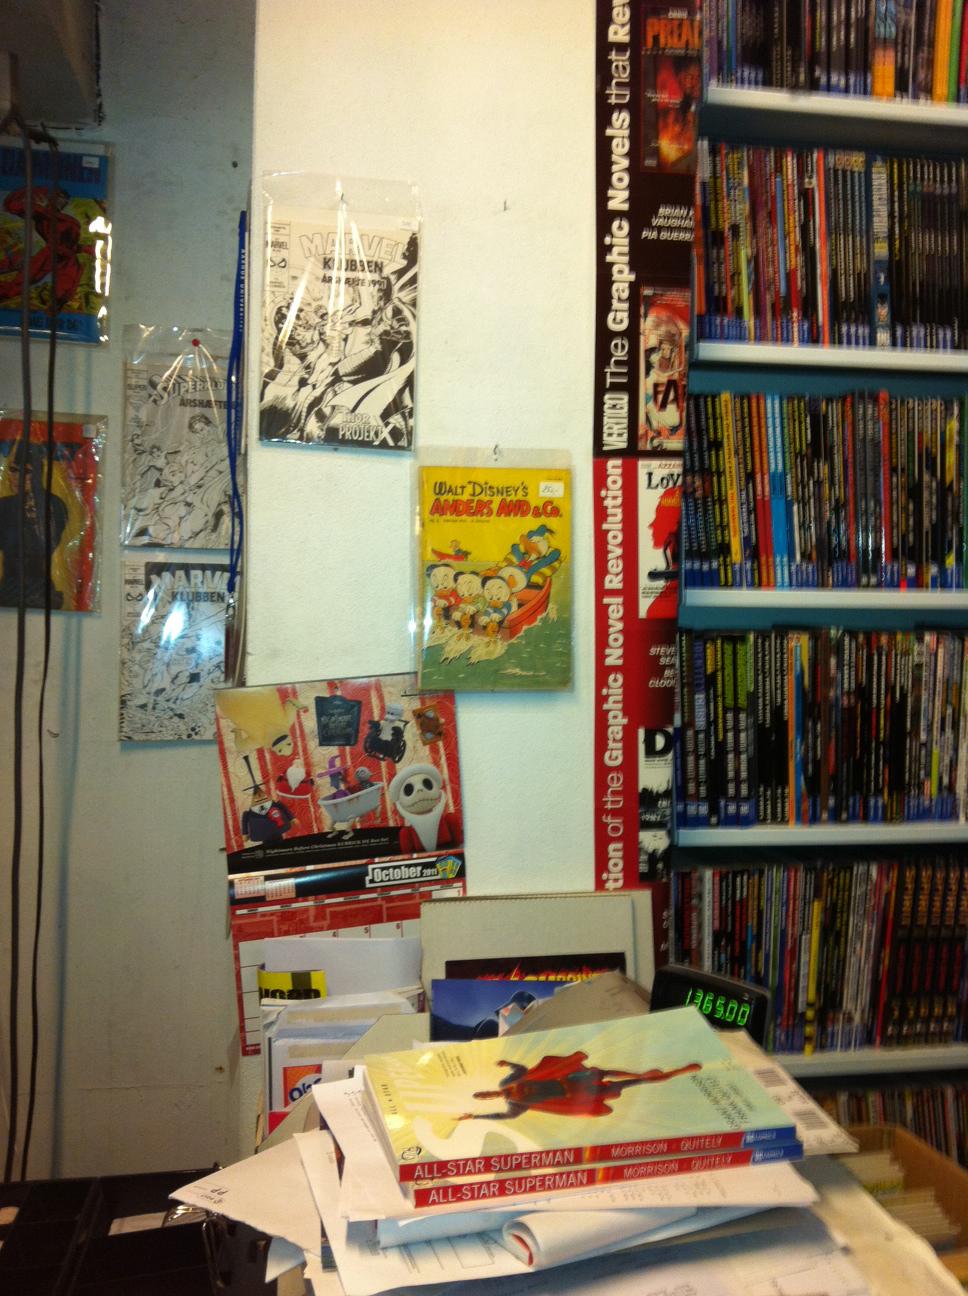 Danish comic book store in Aarhus Jutland